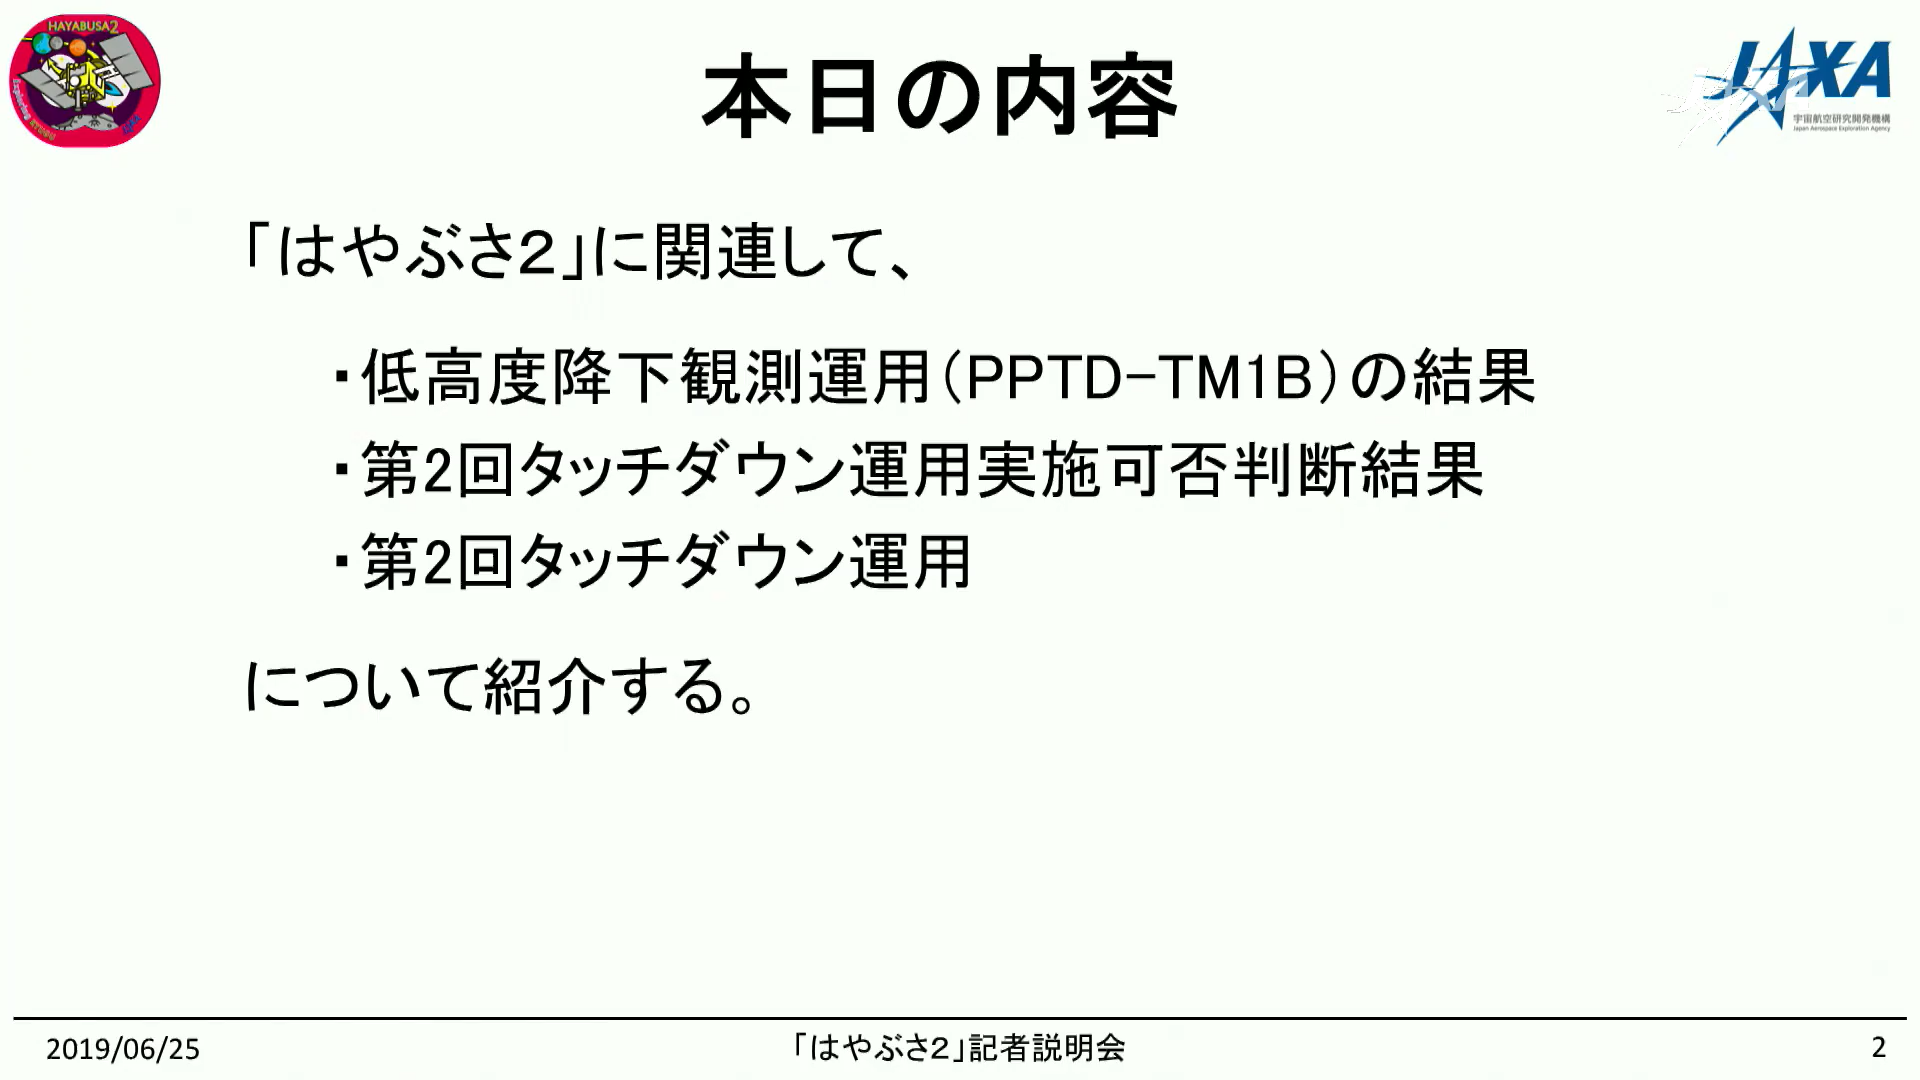 f:id:Imamura:20190625234630p:plain